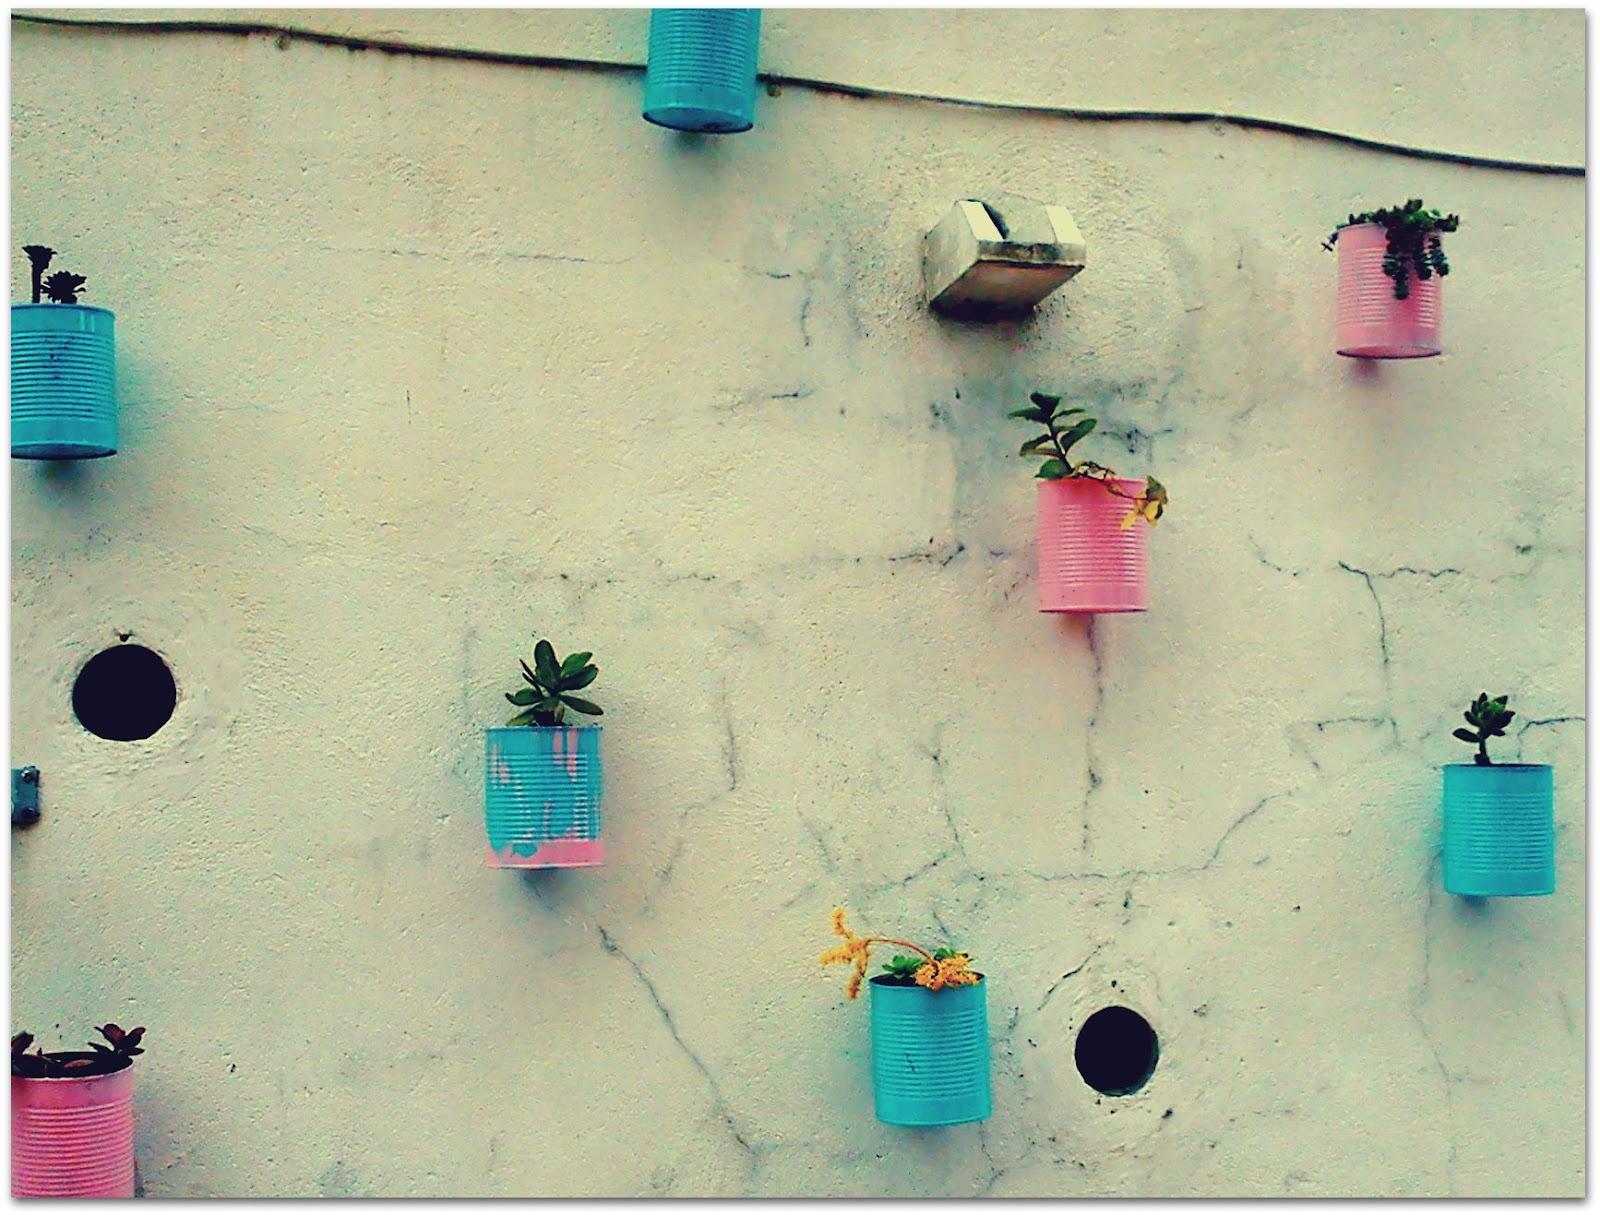 Núria R. Motjer: experimentos de reciclaje y fotografia